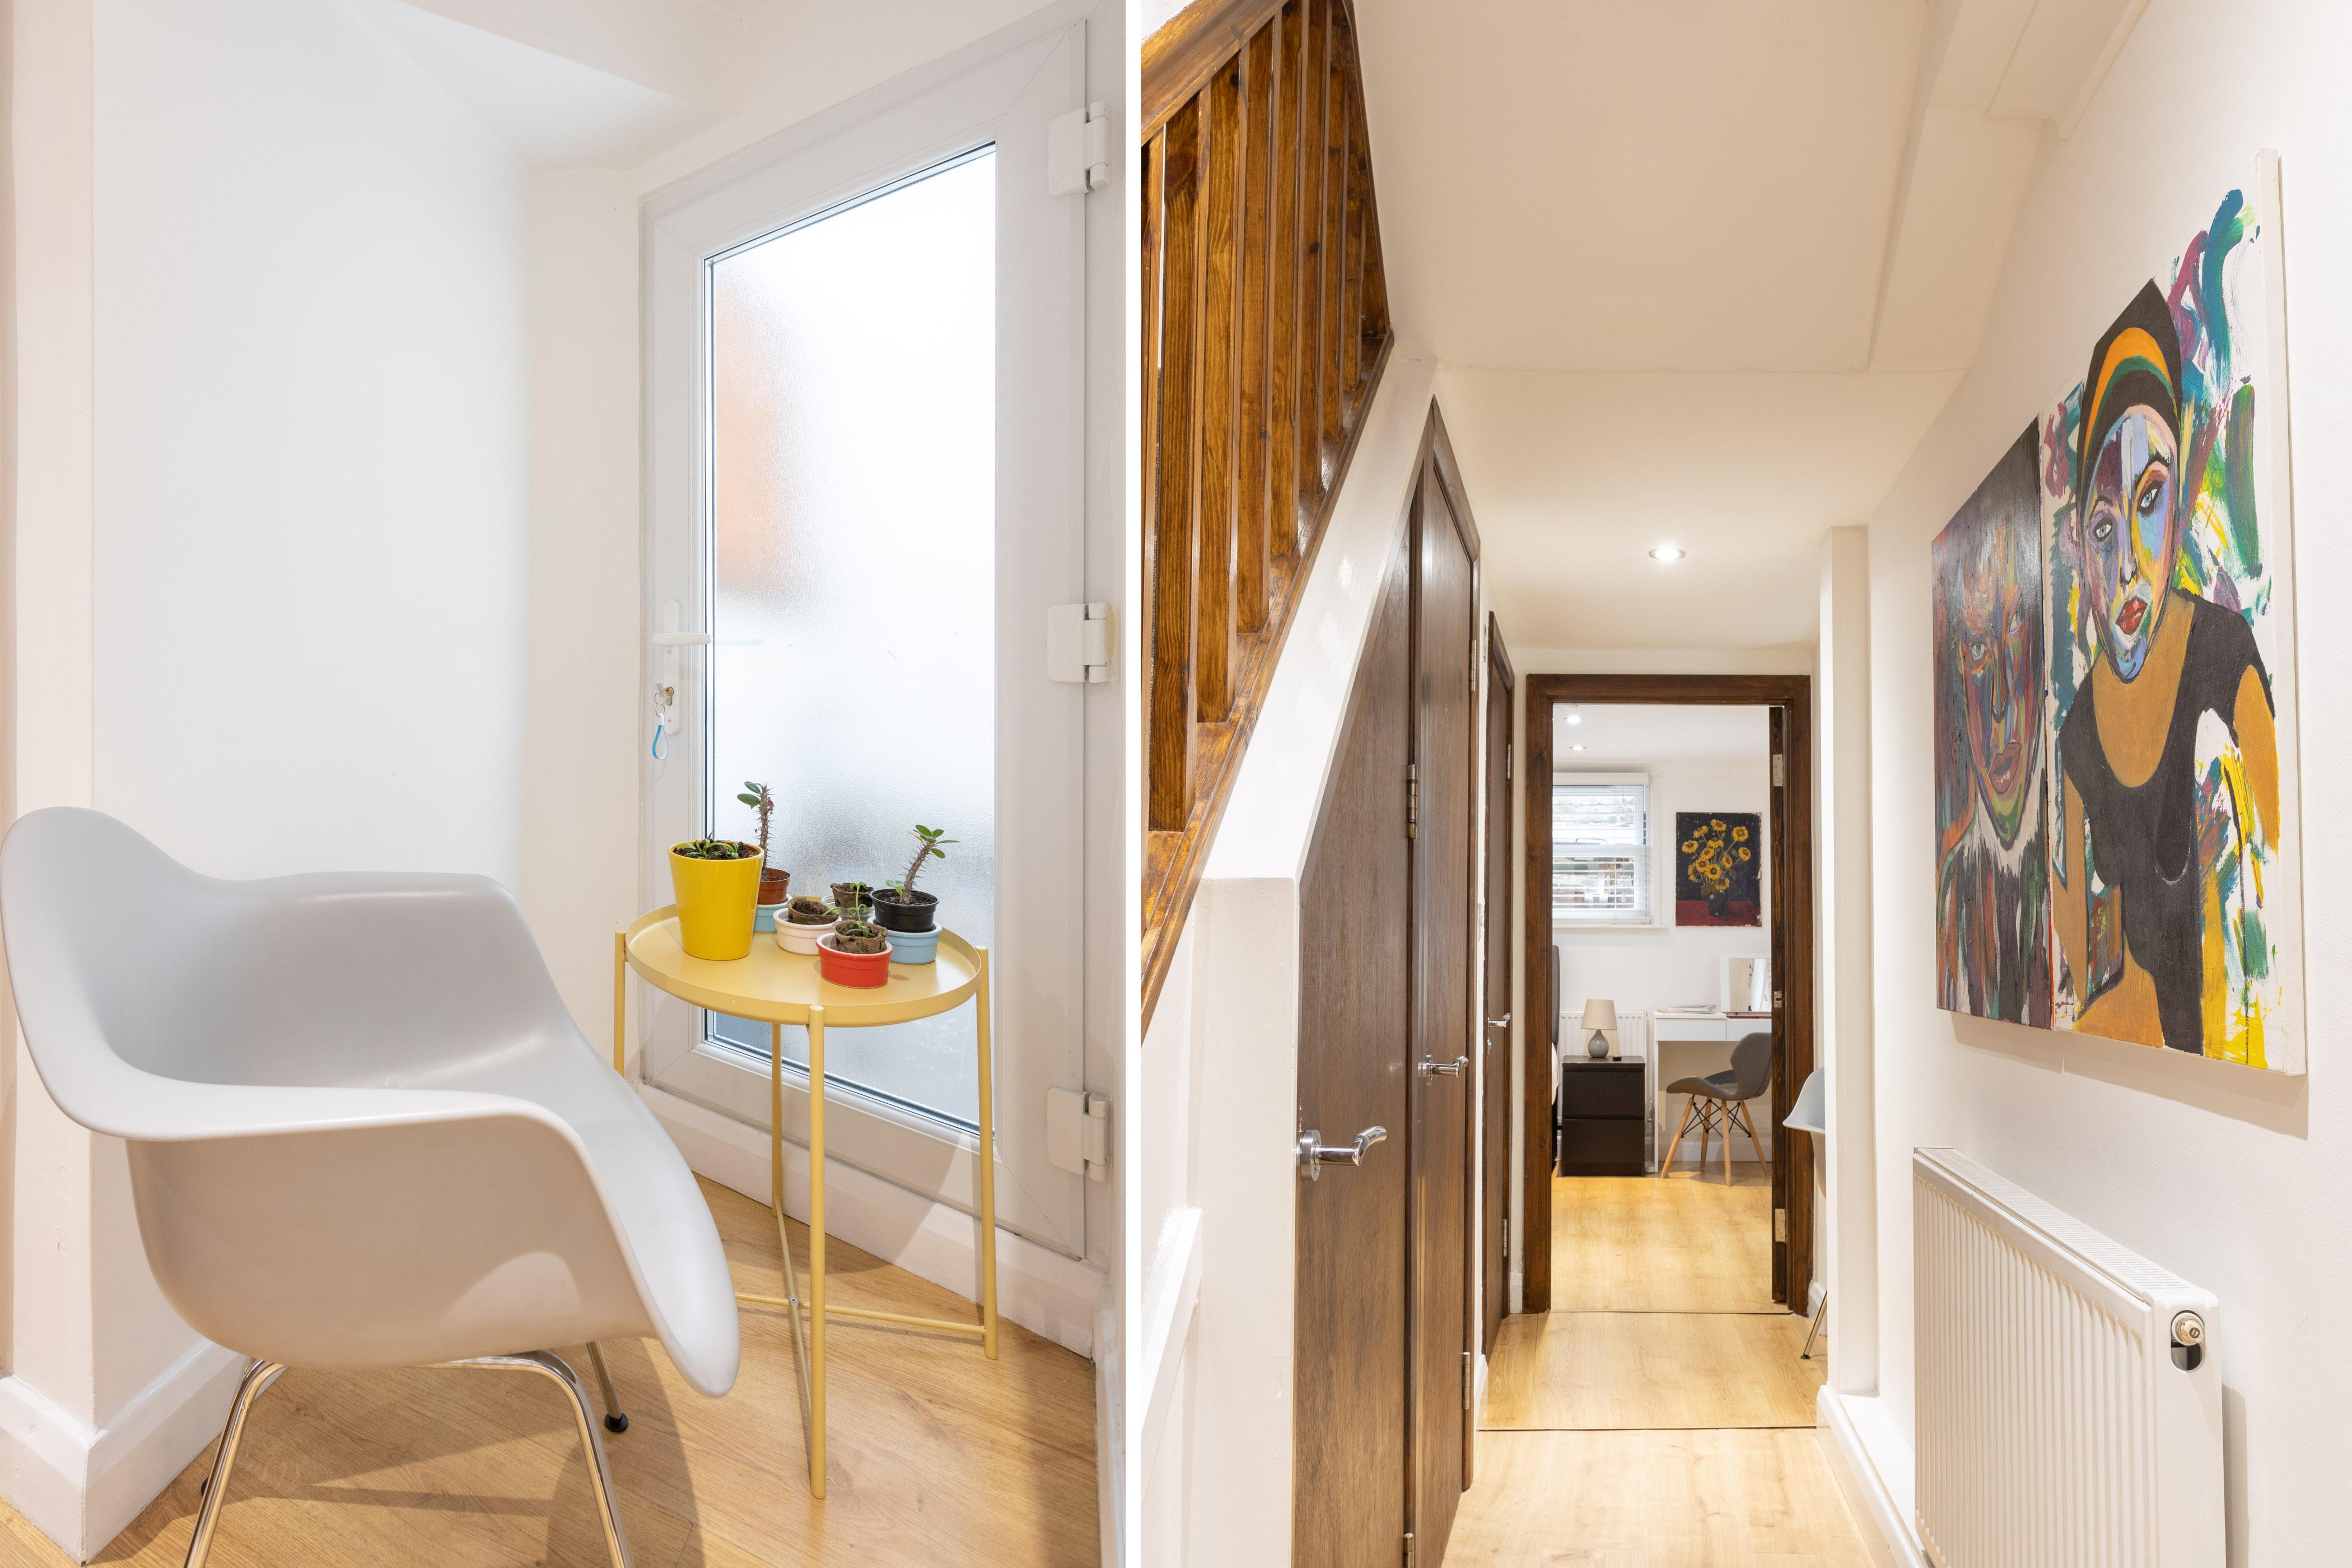 King's Cross Eurostar Double Room - Shared Bathroom - Shared Kitchen (ROOM 4) photo 26059382